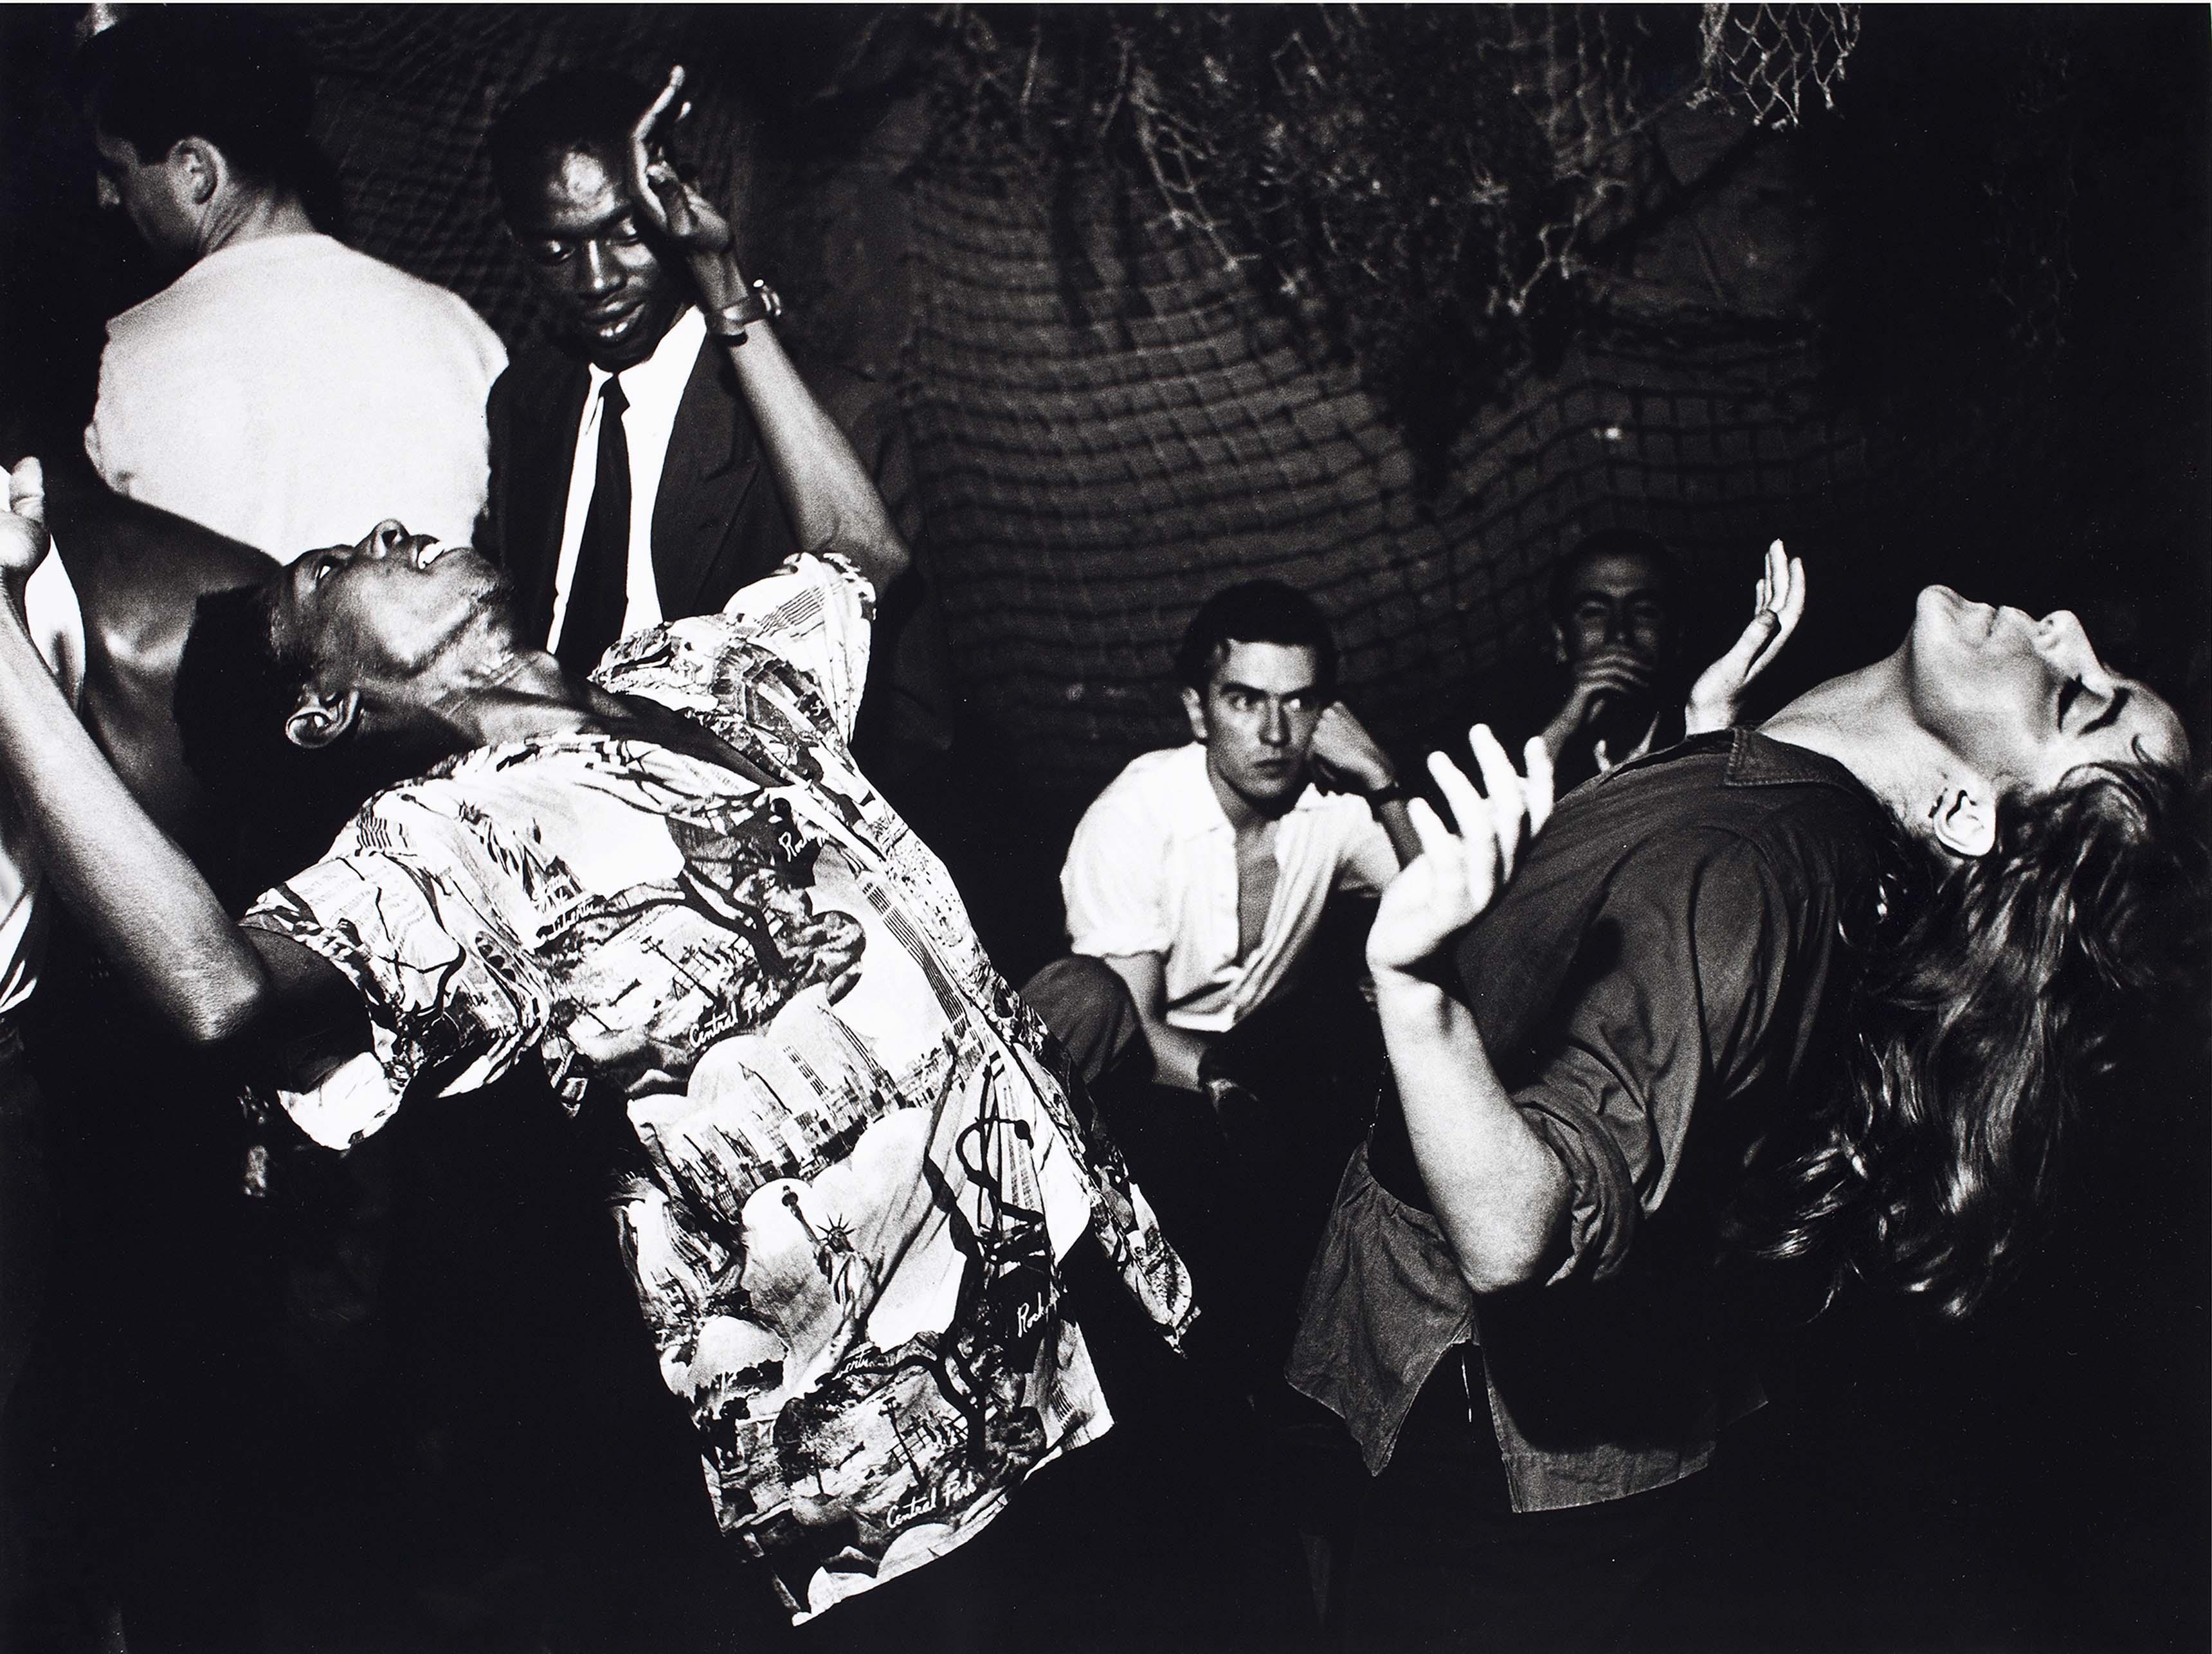 Ed van der Elsken, Vali Myers (Ann) danse à La Scala, Paris, 1950. Nederlands Fotomuseum Rotterdam © Ed van der Elsken / Collection Stedelijk Museum Amsterdam